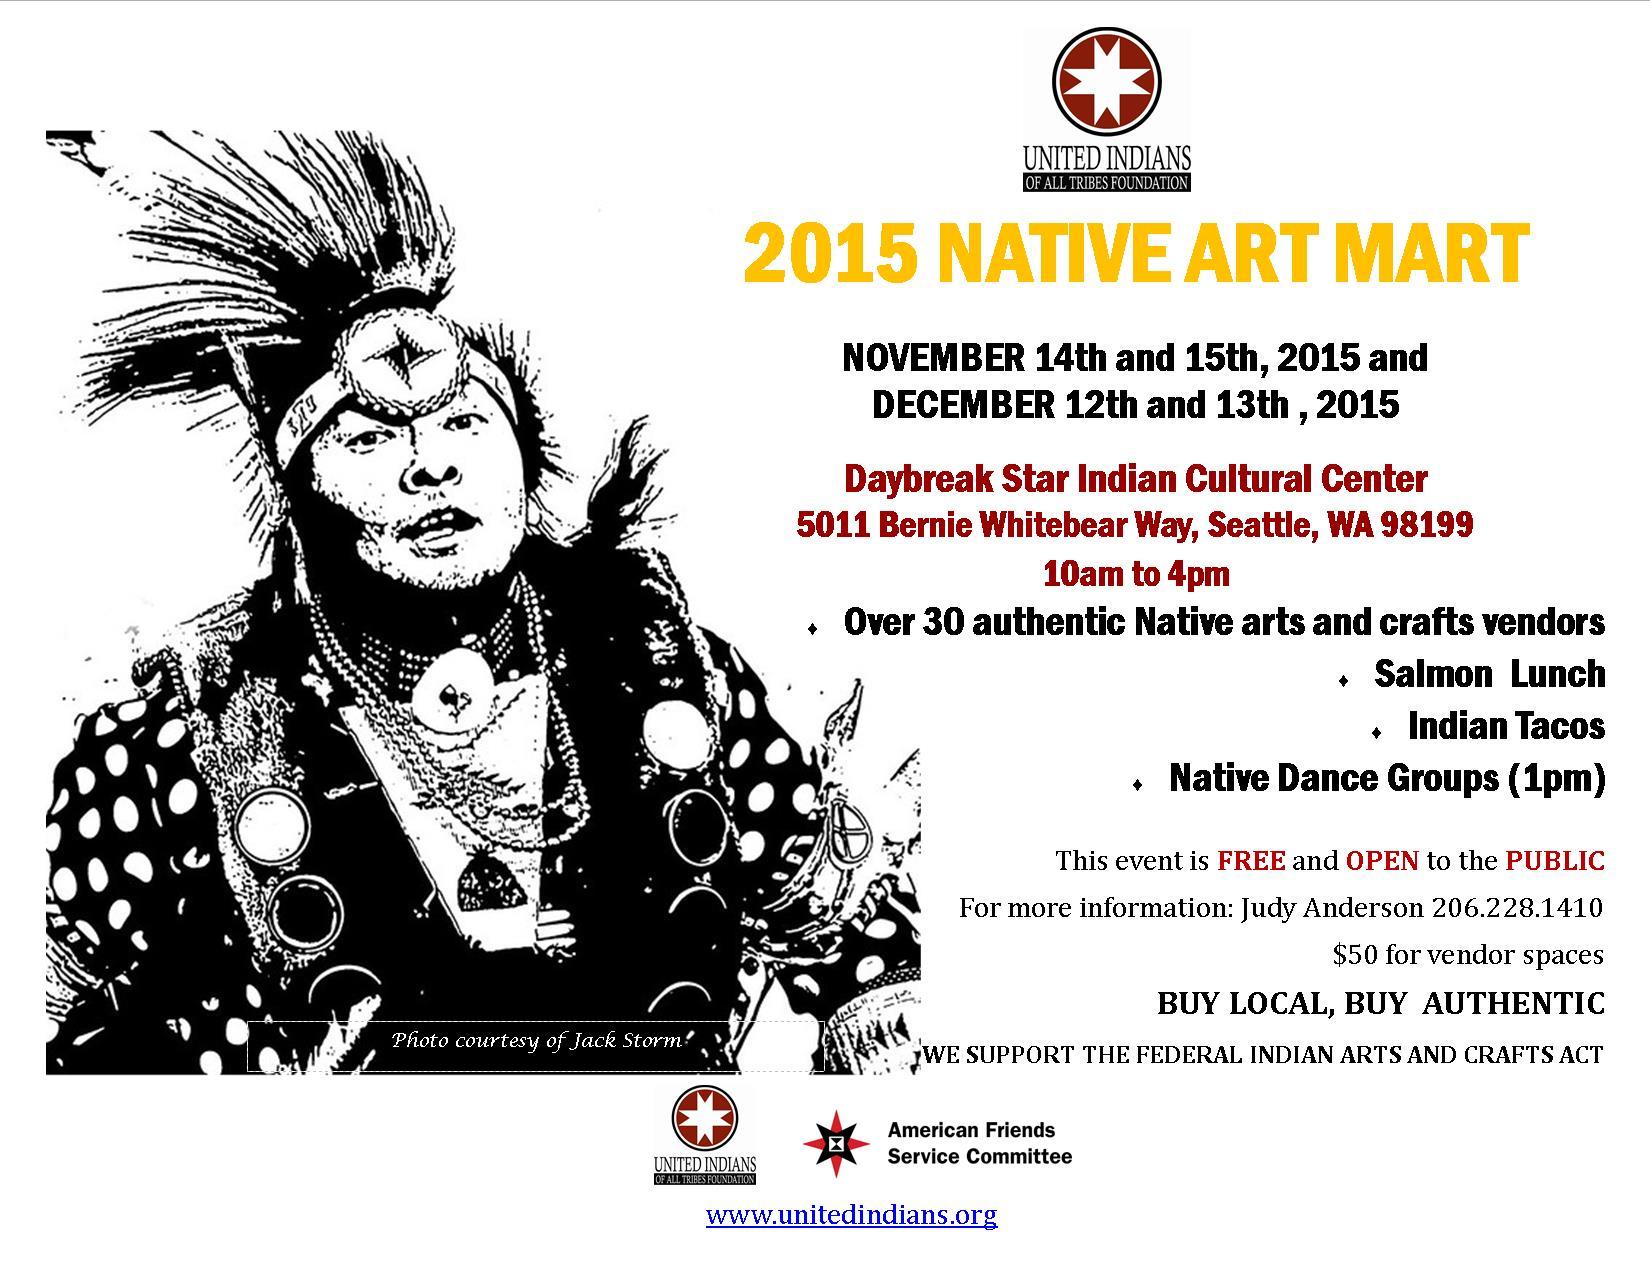 2015 Art Mart flier